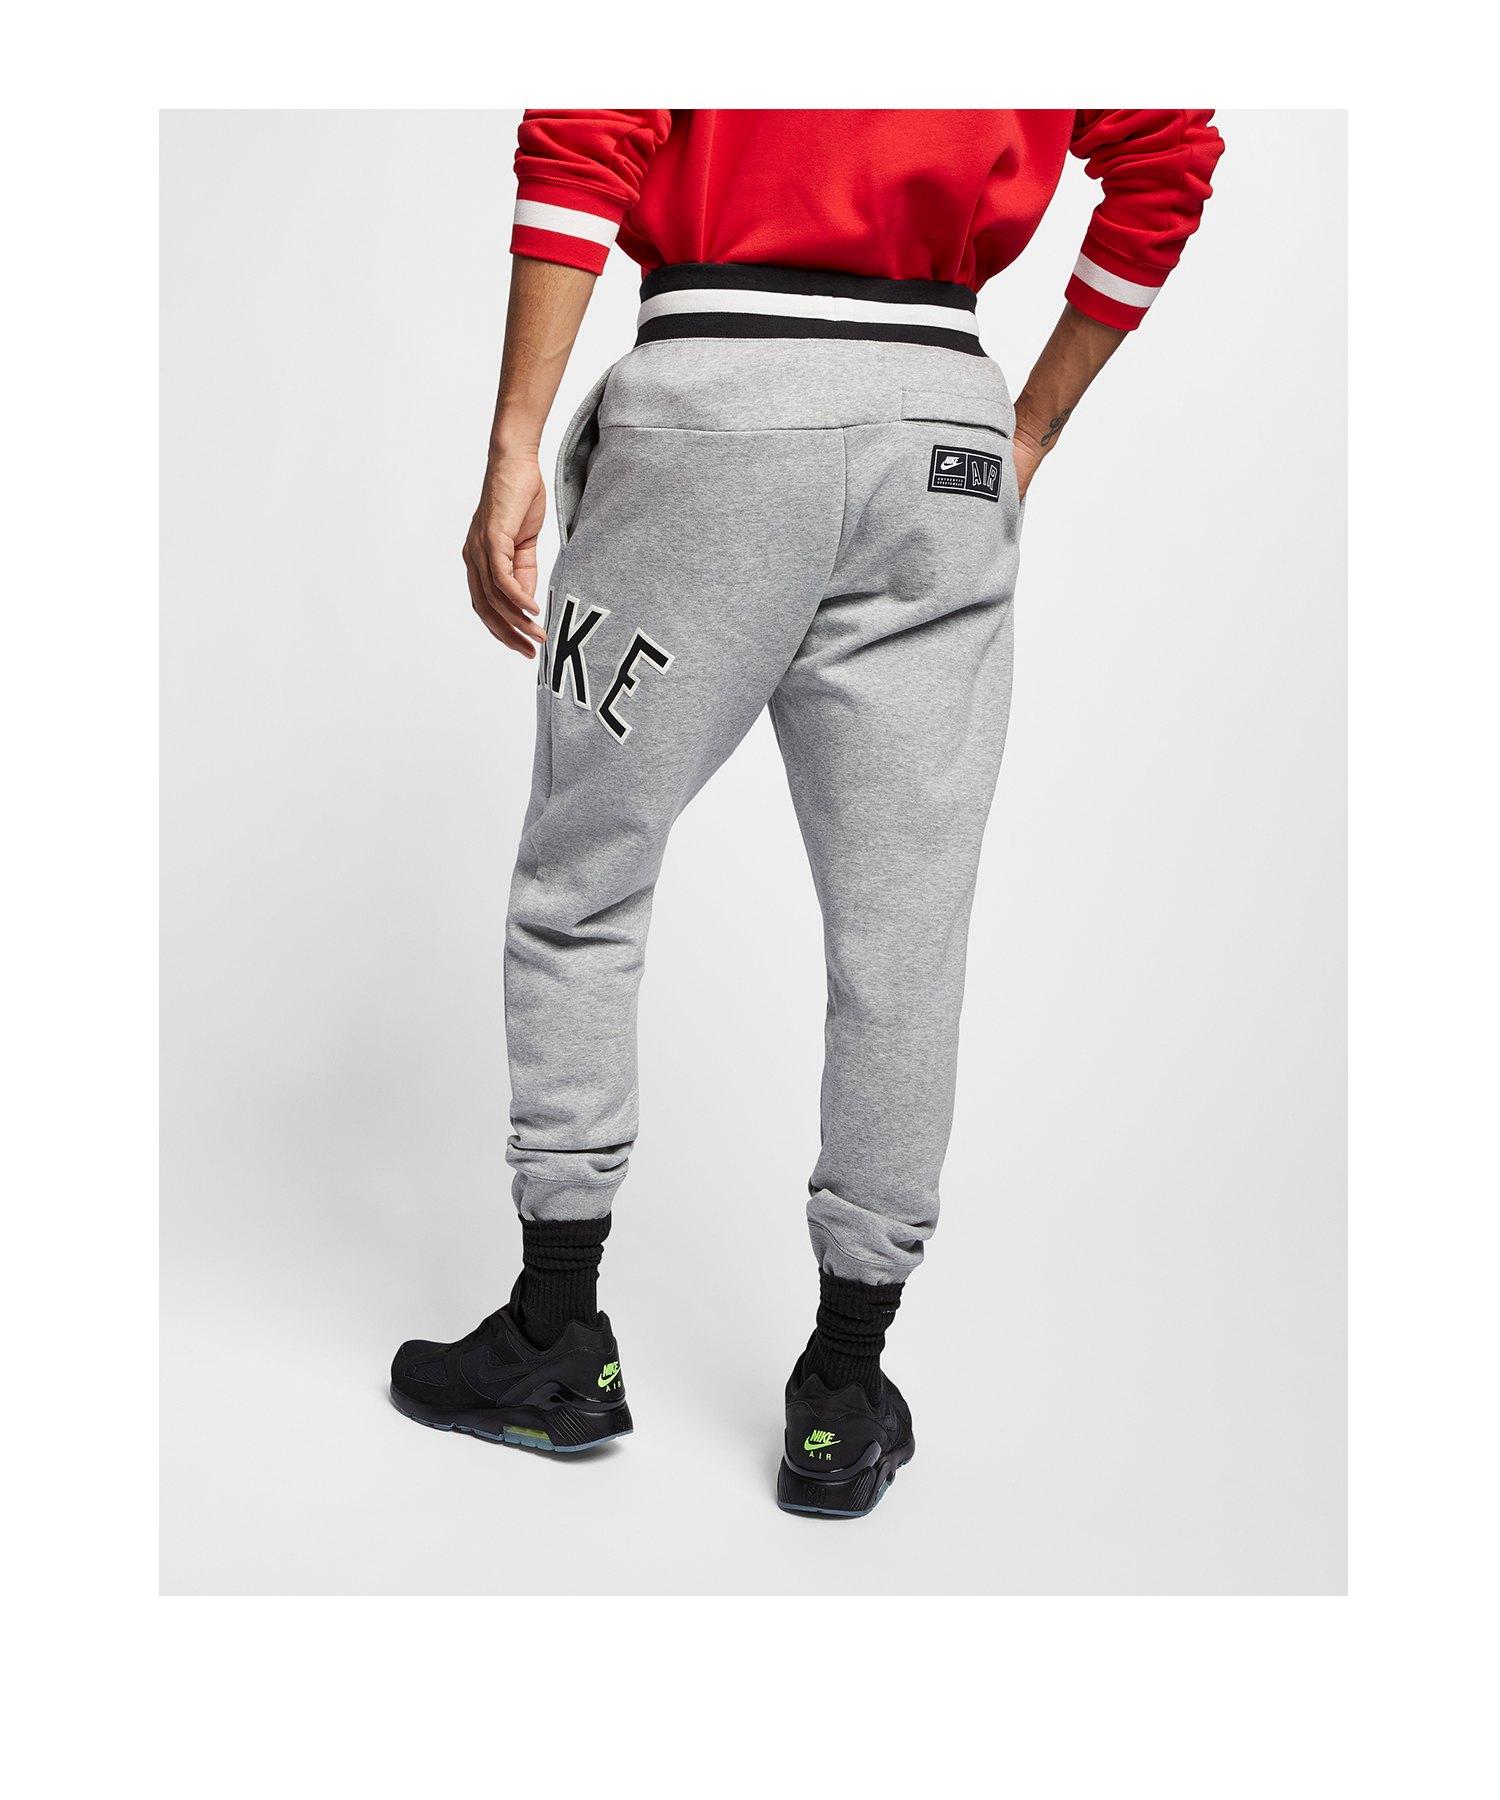 f9603721e07c48 ... Nike Air Retro Pant Jogginghose Grau F063 - Grau ...